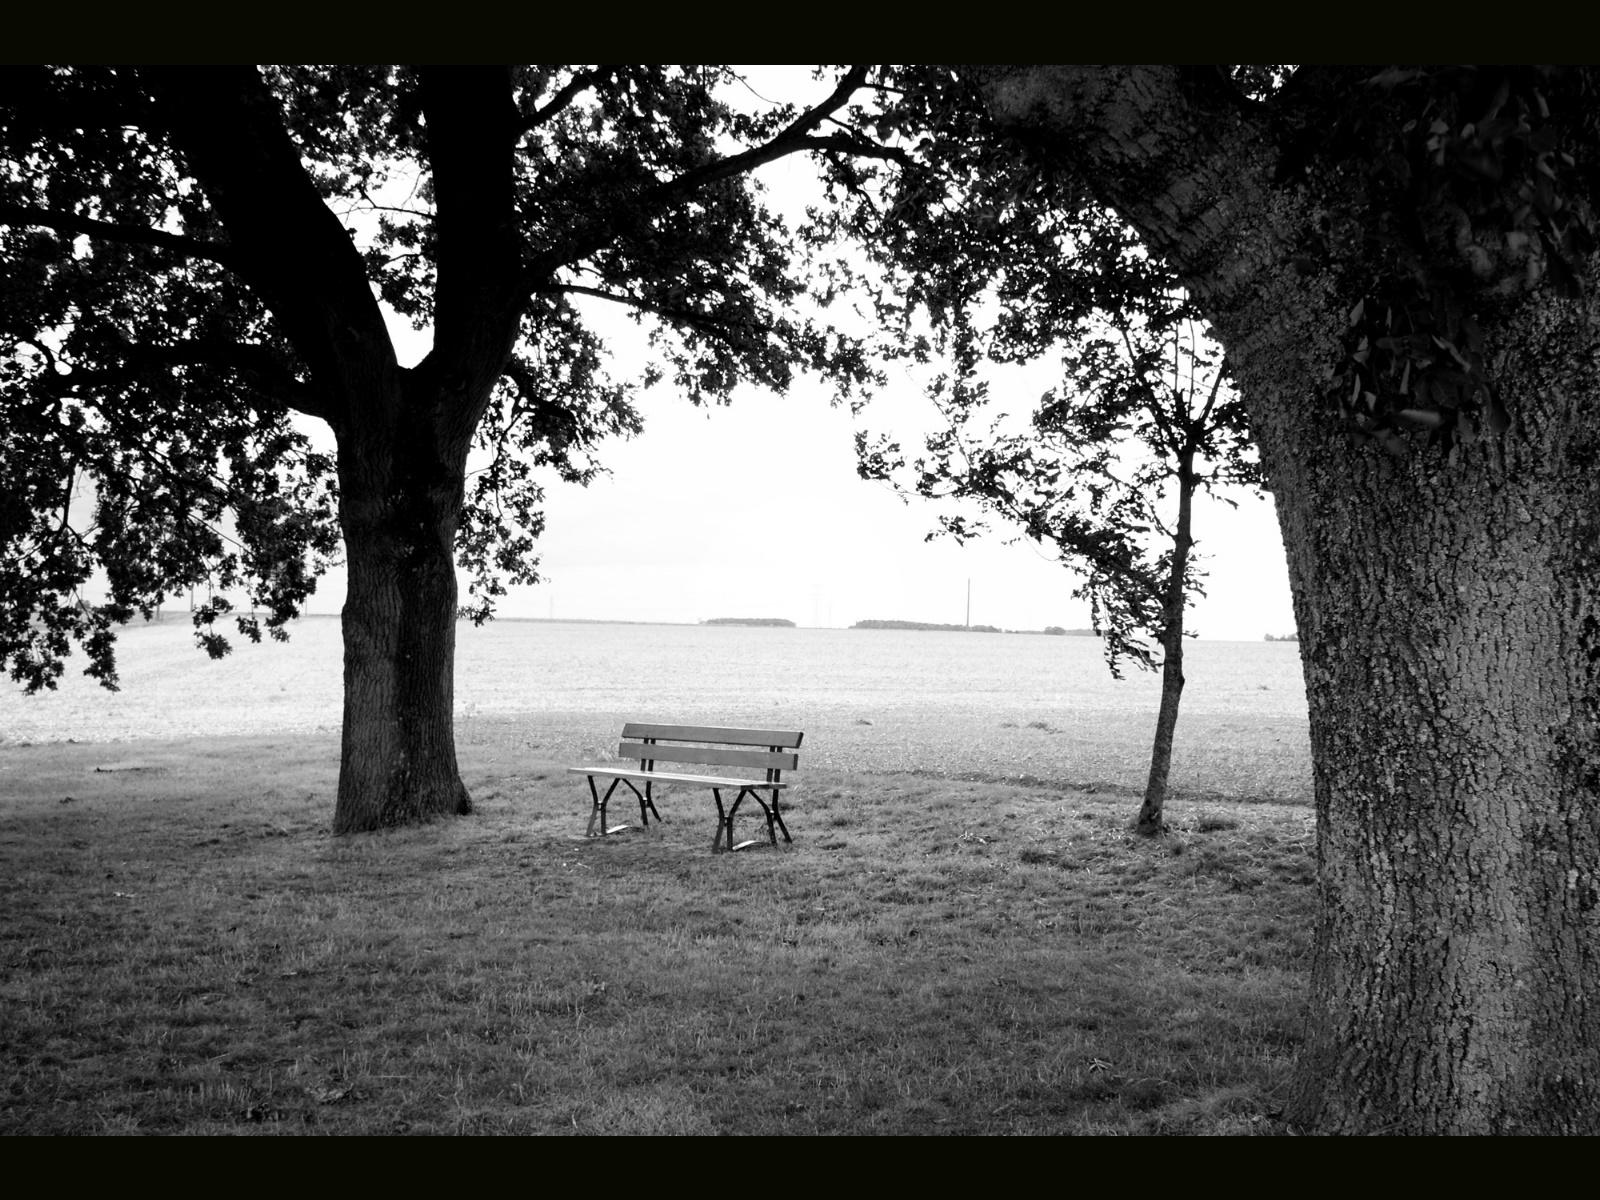 banco de jardim frases:Frases de grandes pensadores ~ etéreamusic